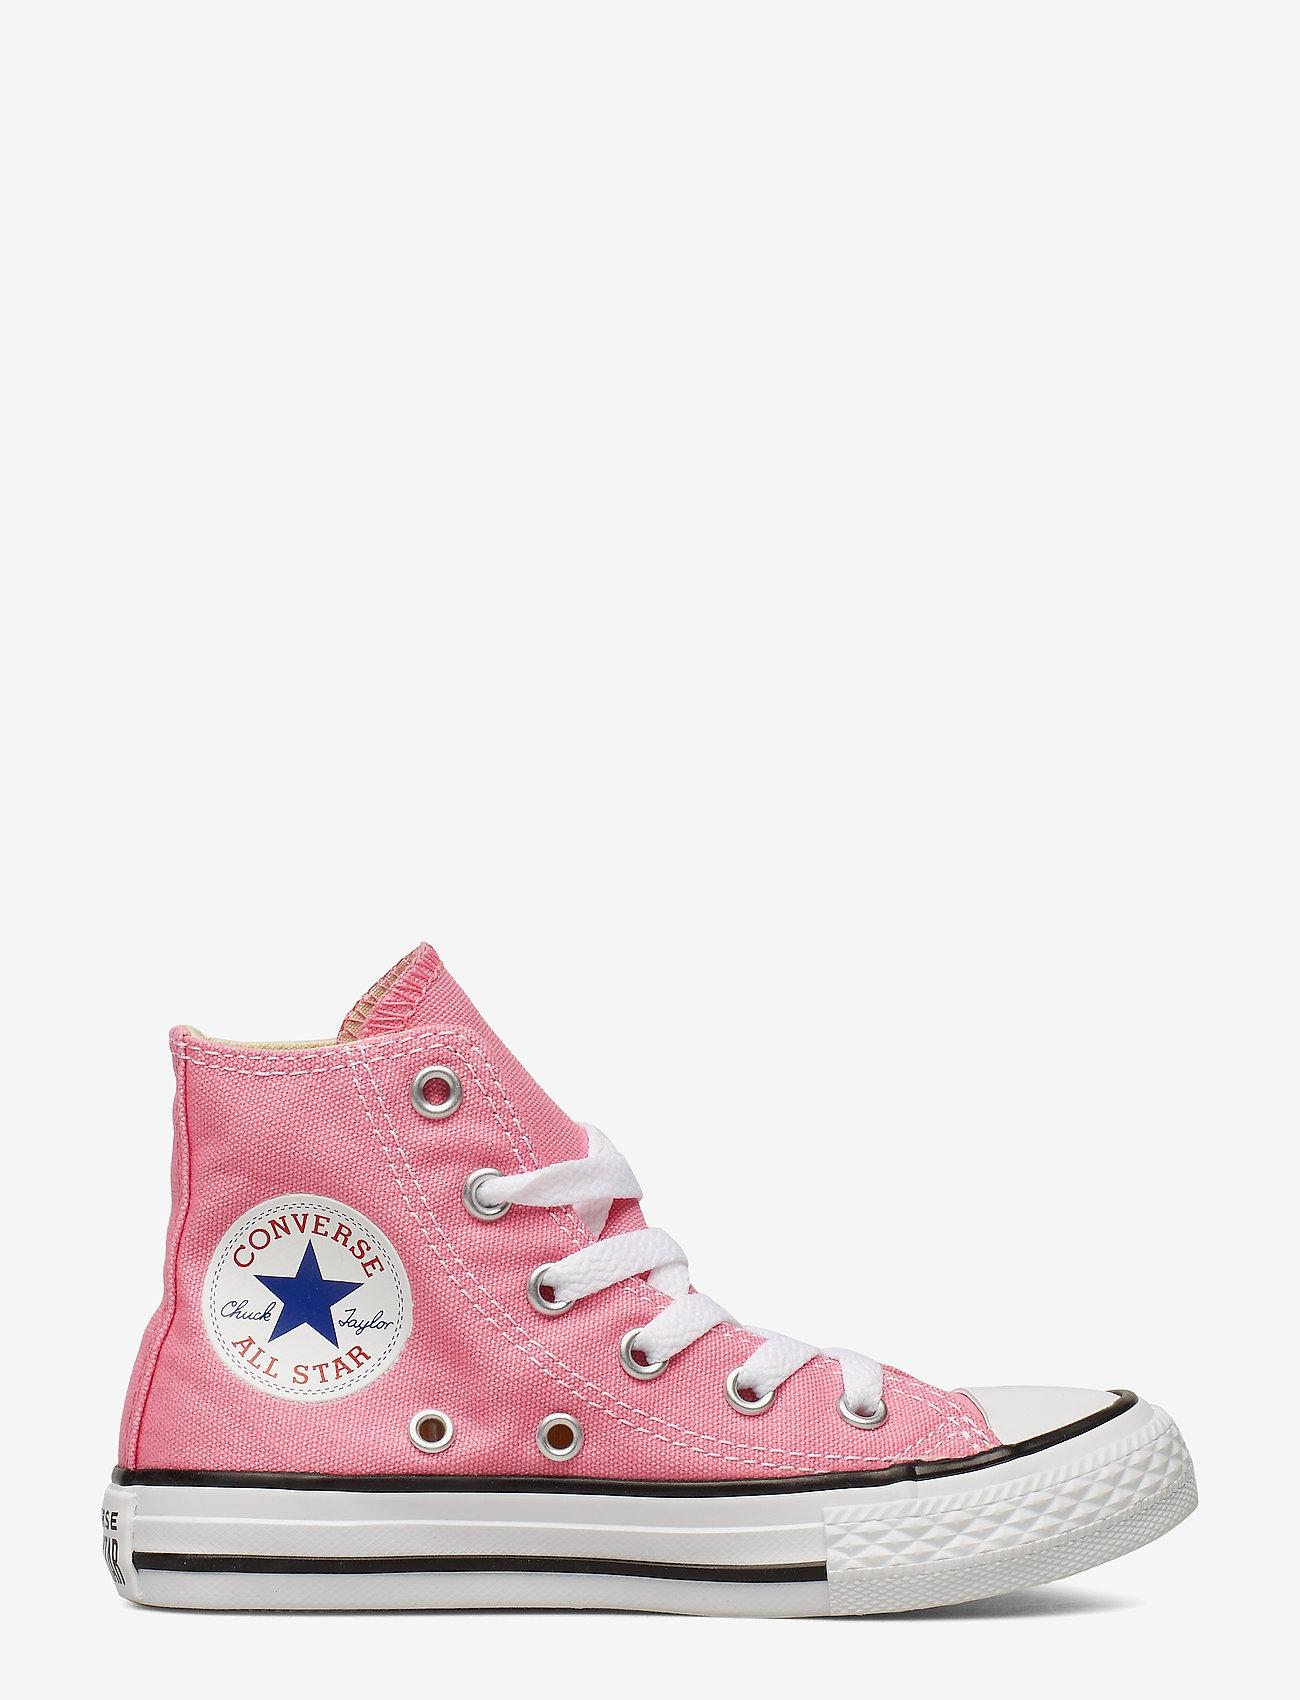 Converse - YTHS C/T ALLSTAR HI - sneakers - pink - 1